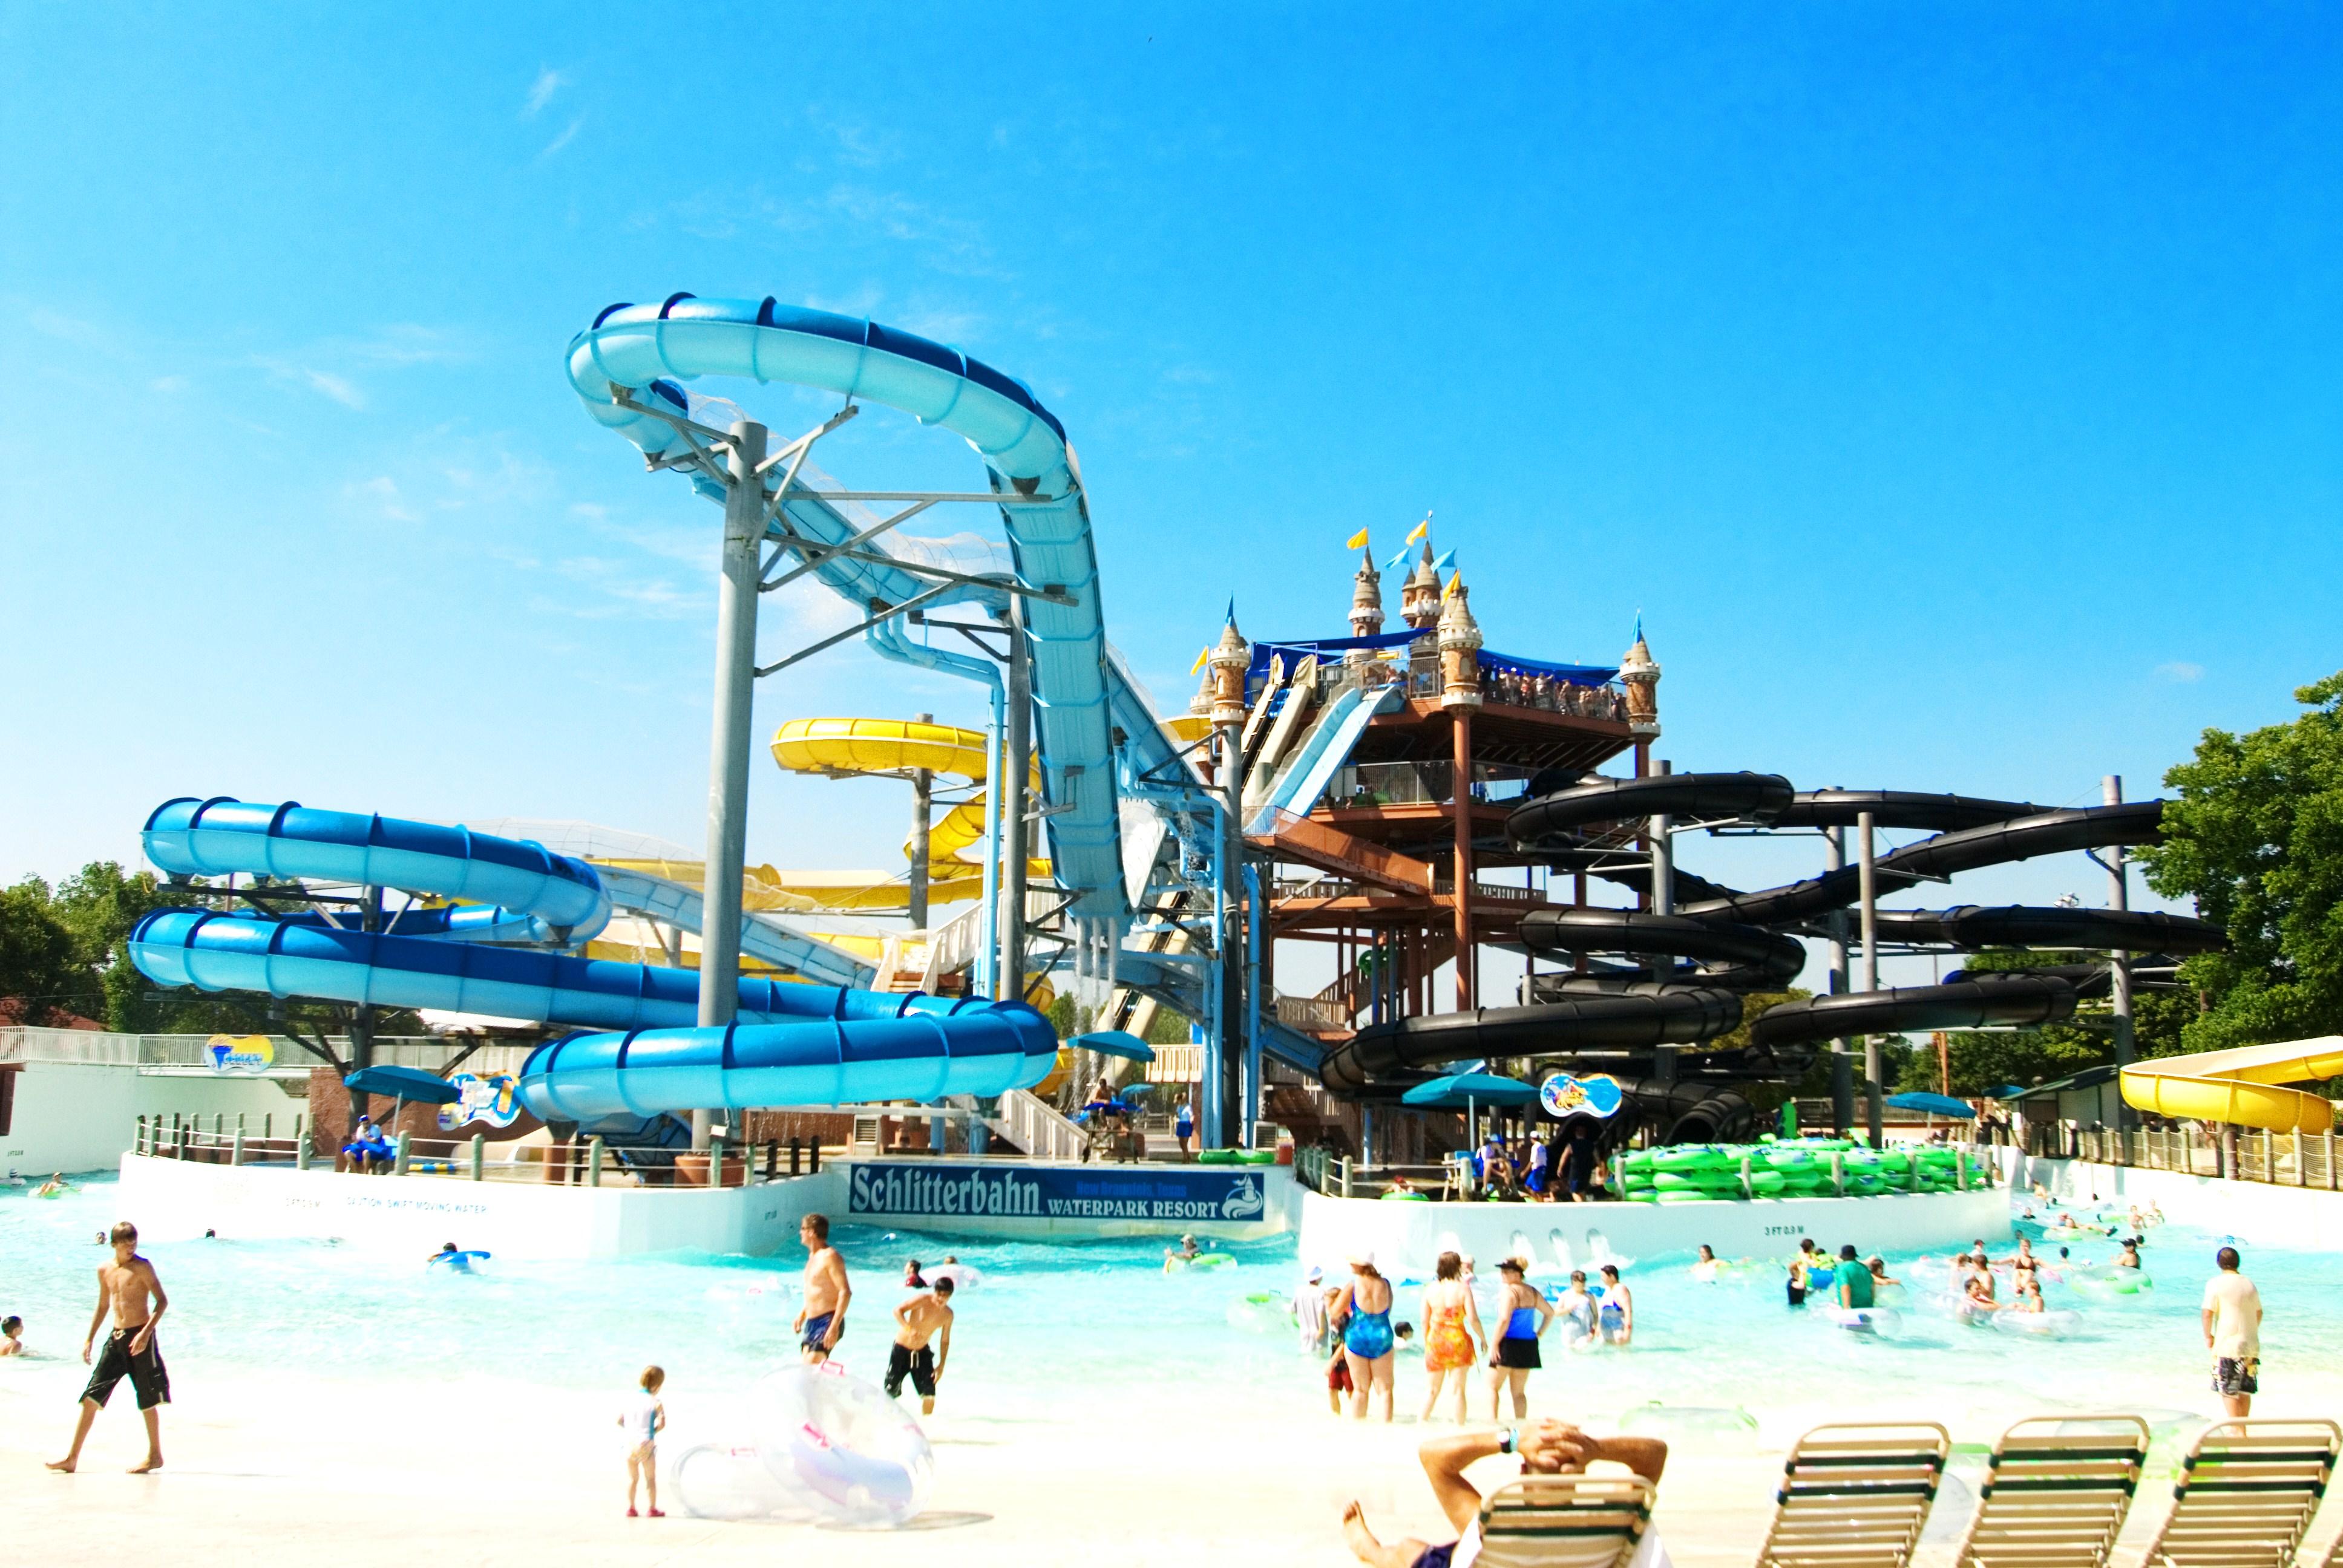 Schlitterbahn Waterpark Resort in Texas